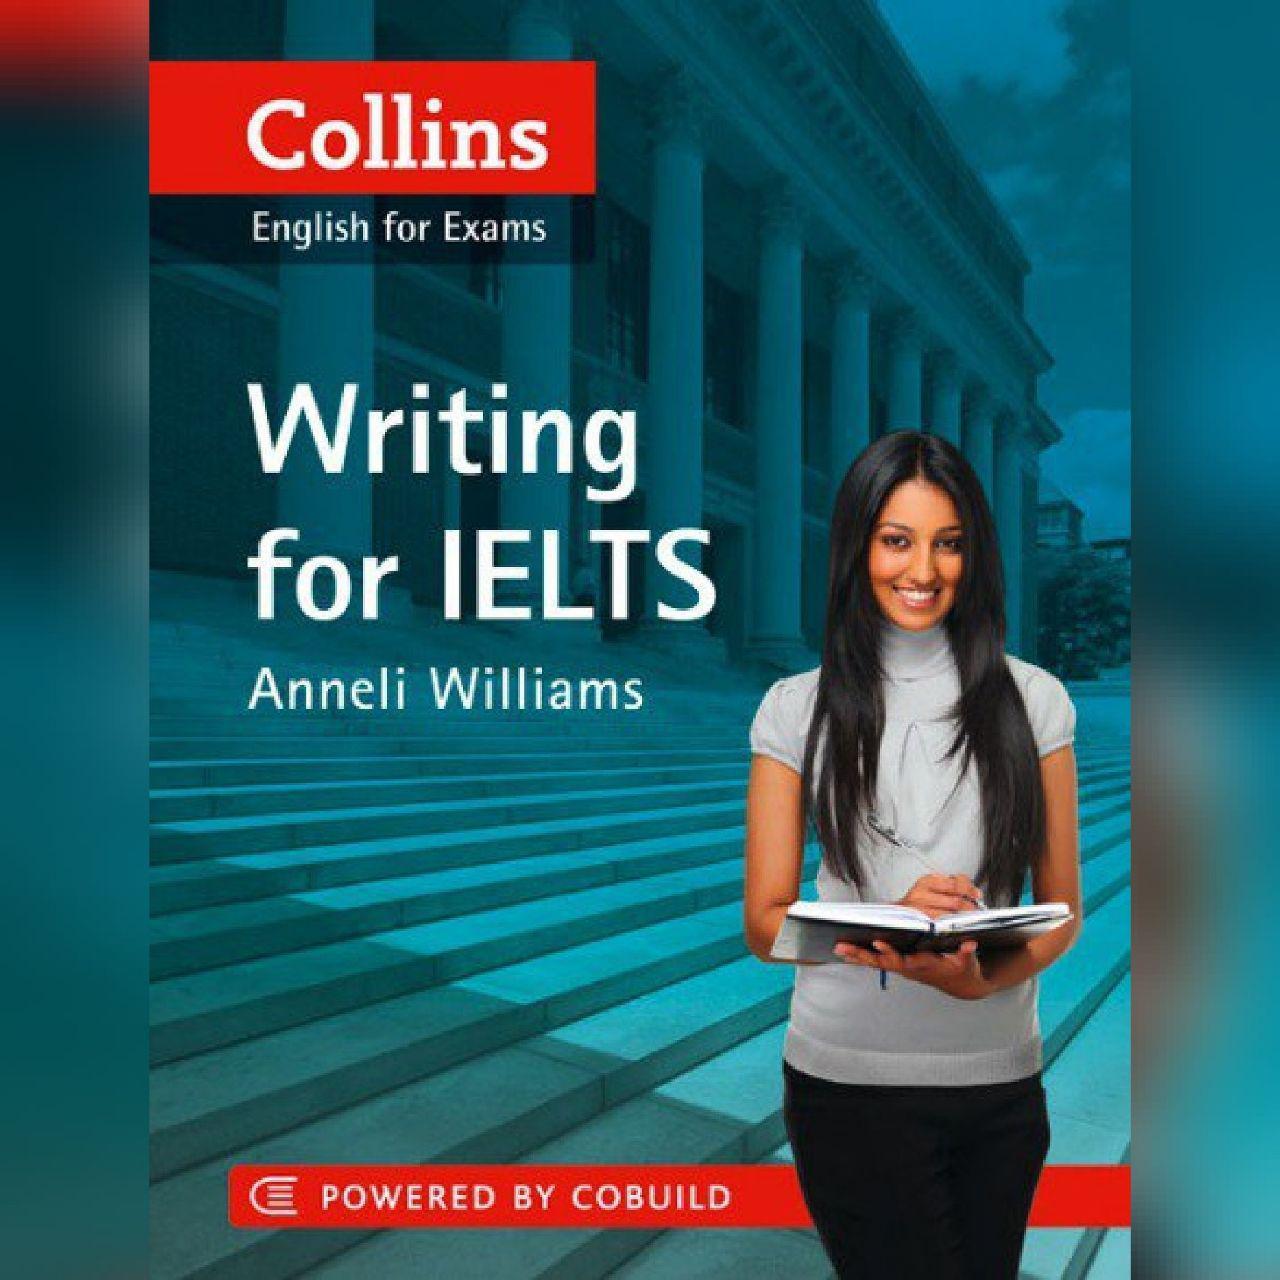 دانلود کتاب Writing for IELTS